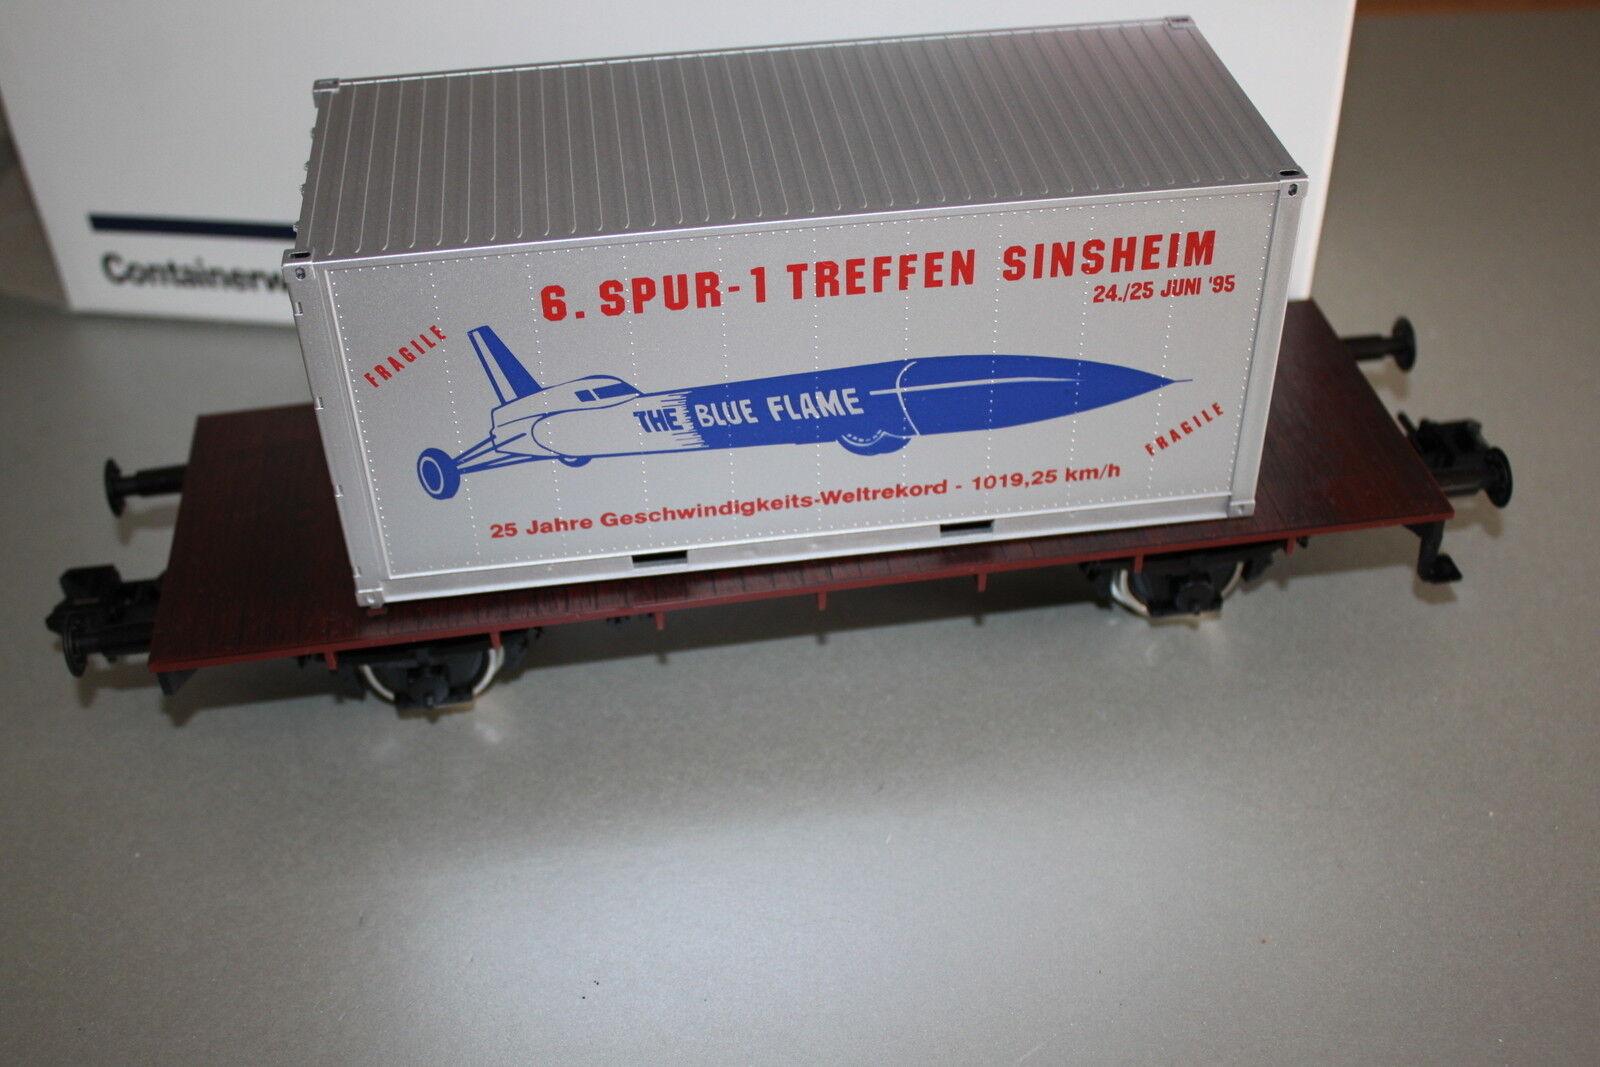 2-Camion Container Carrello  blu Flame  Sinsheim 1995 traccia 1 OVP